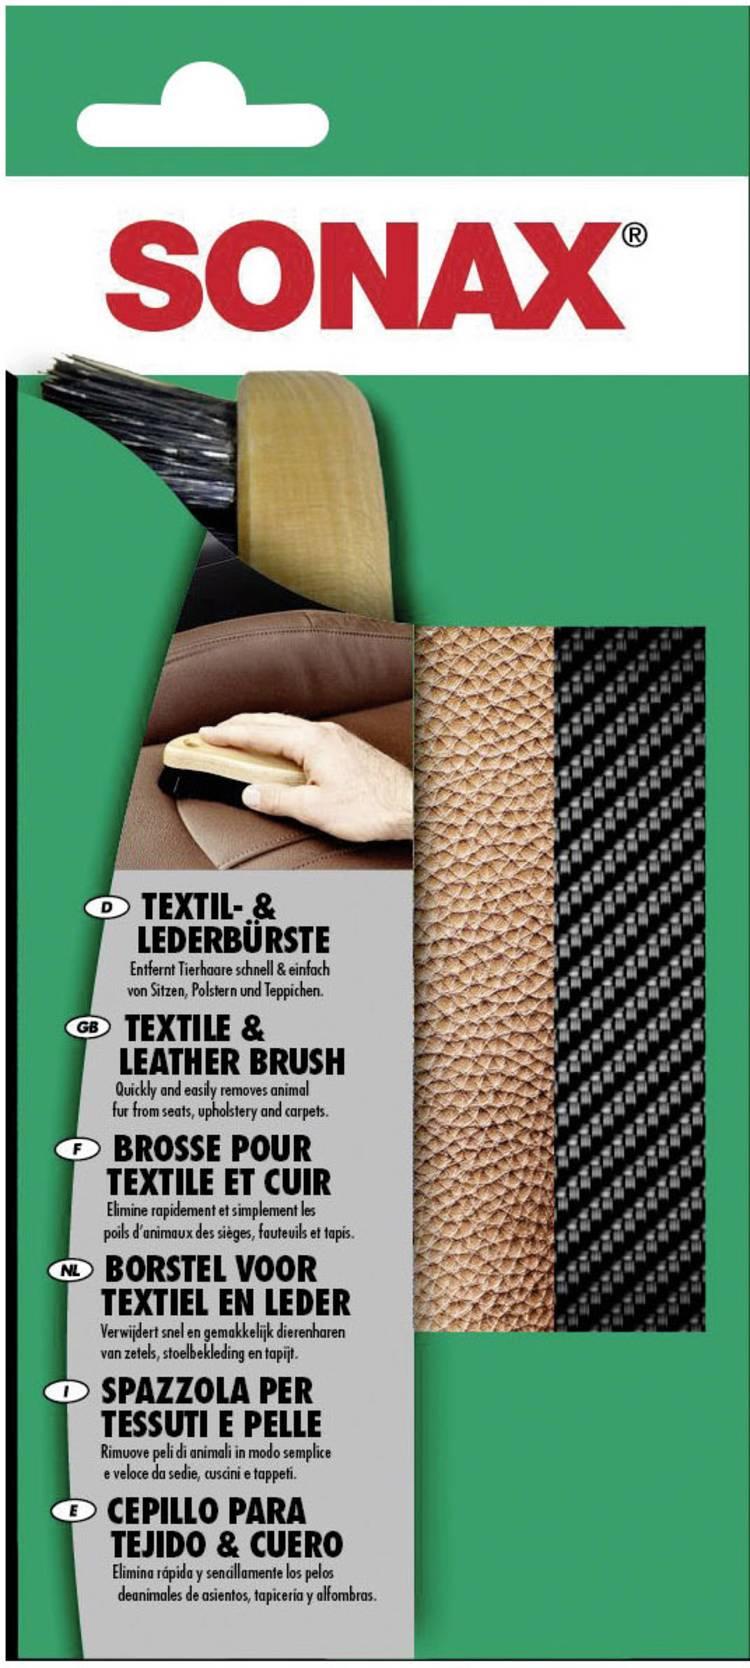 Sonax 416741 Sonax textiel- en lederborstel 1 stuks (b x h) 40 mm x 145 mm